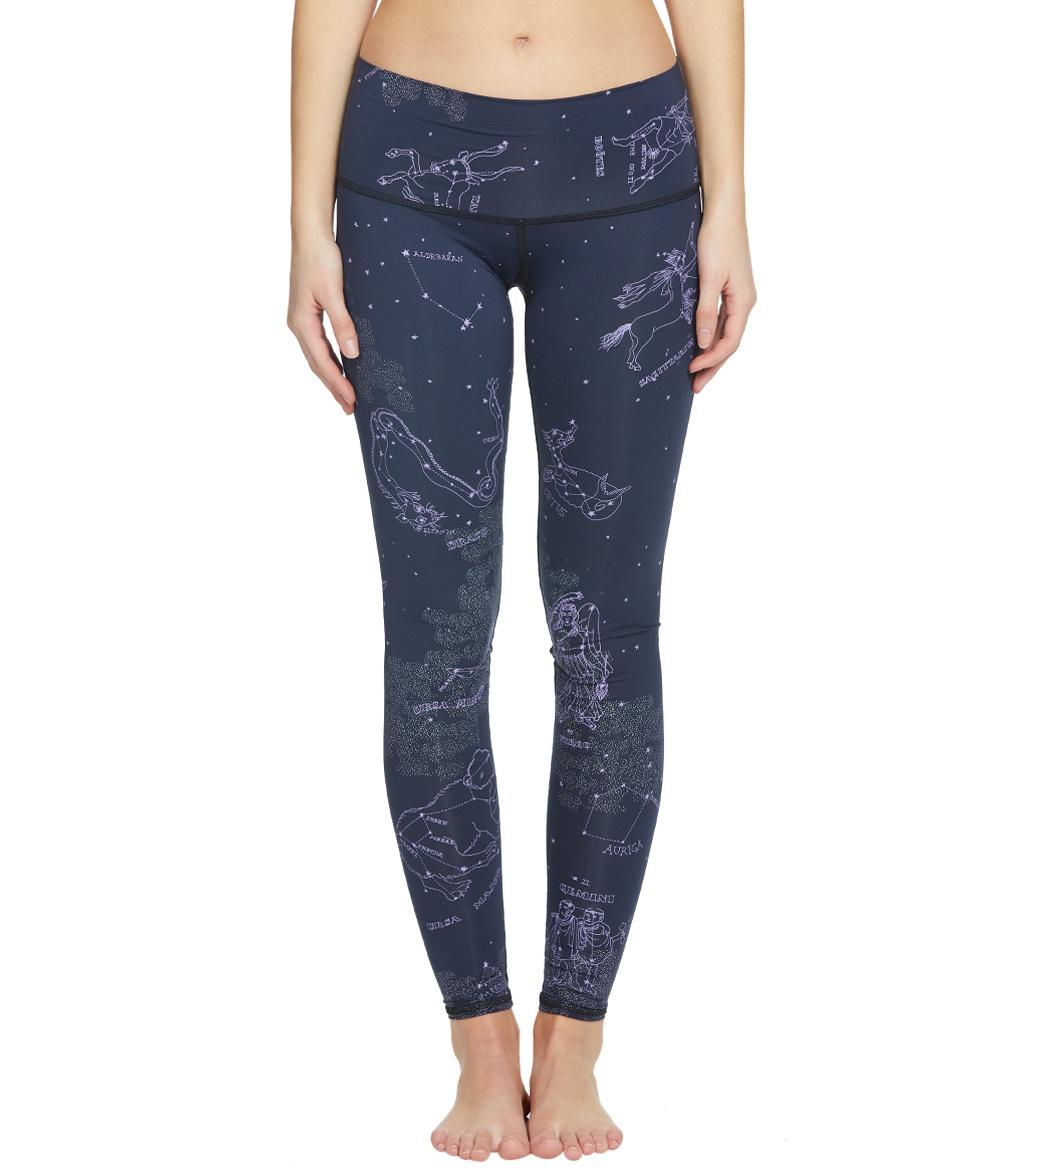 84b2fedf3af1a9 Teeki Stardust Yoga Hot Pant Yoga Leggings at YogaOutlet.com - Free Shipping